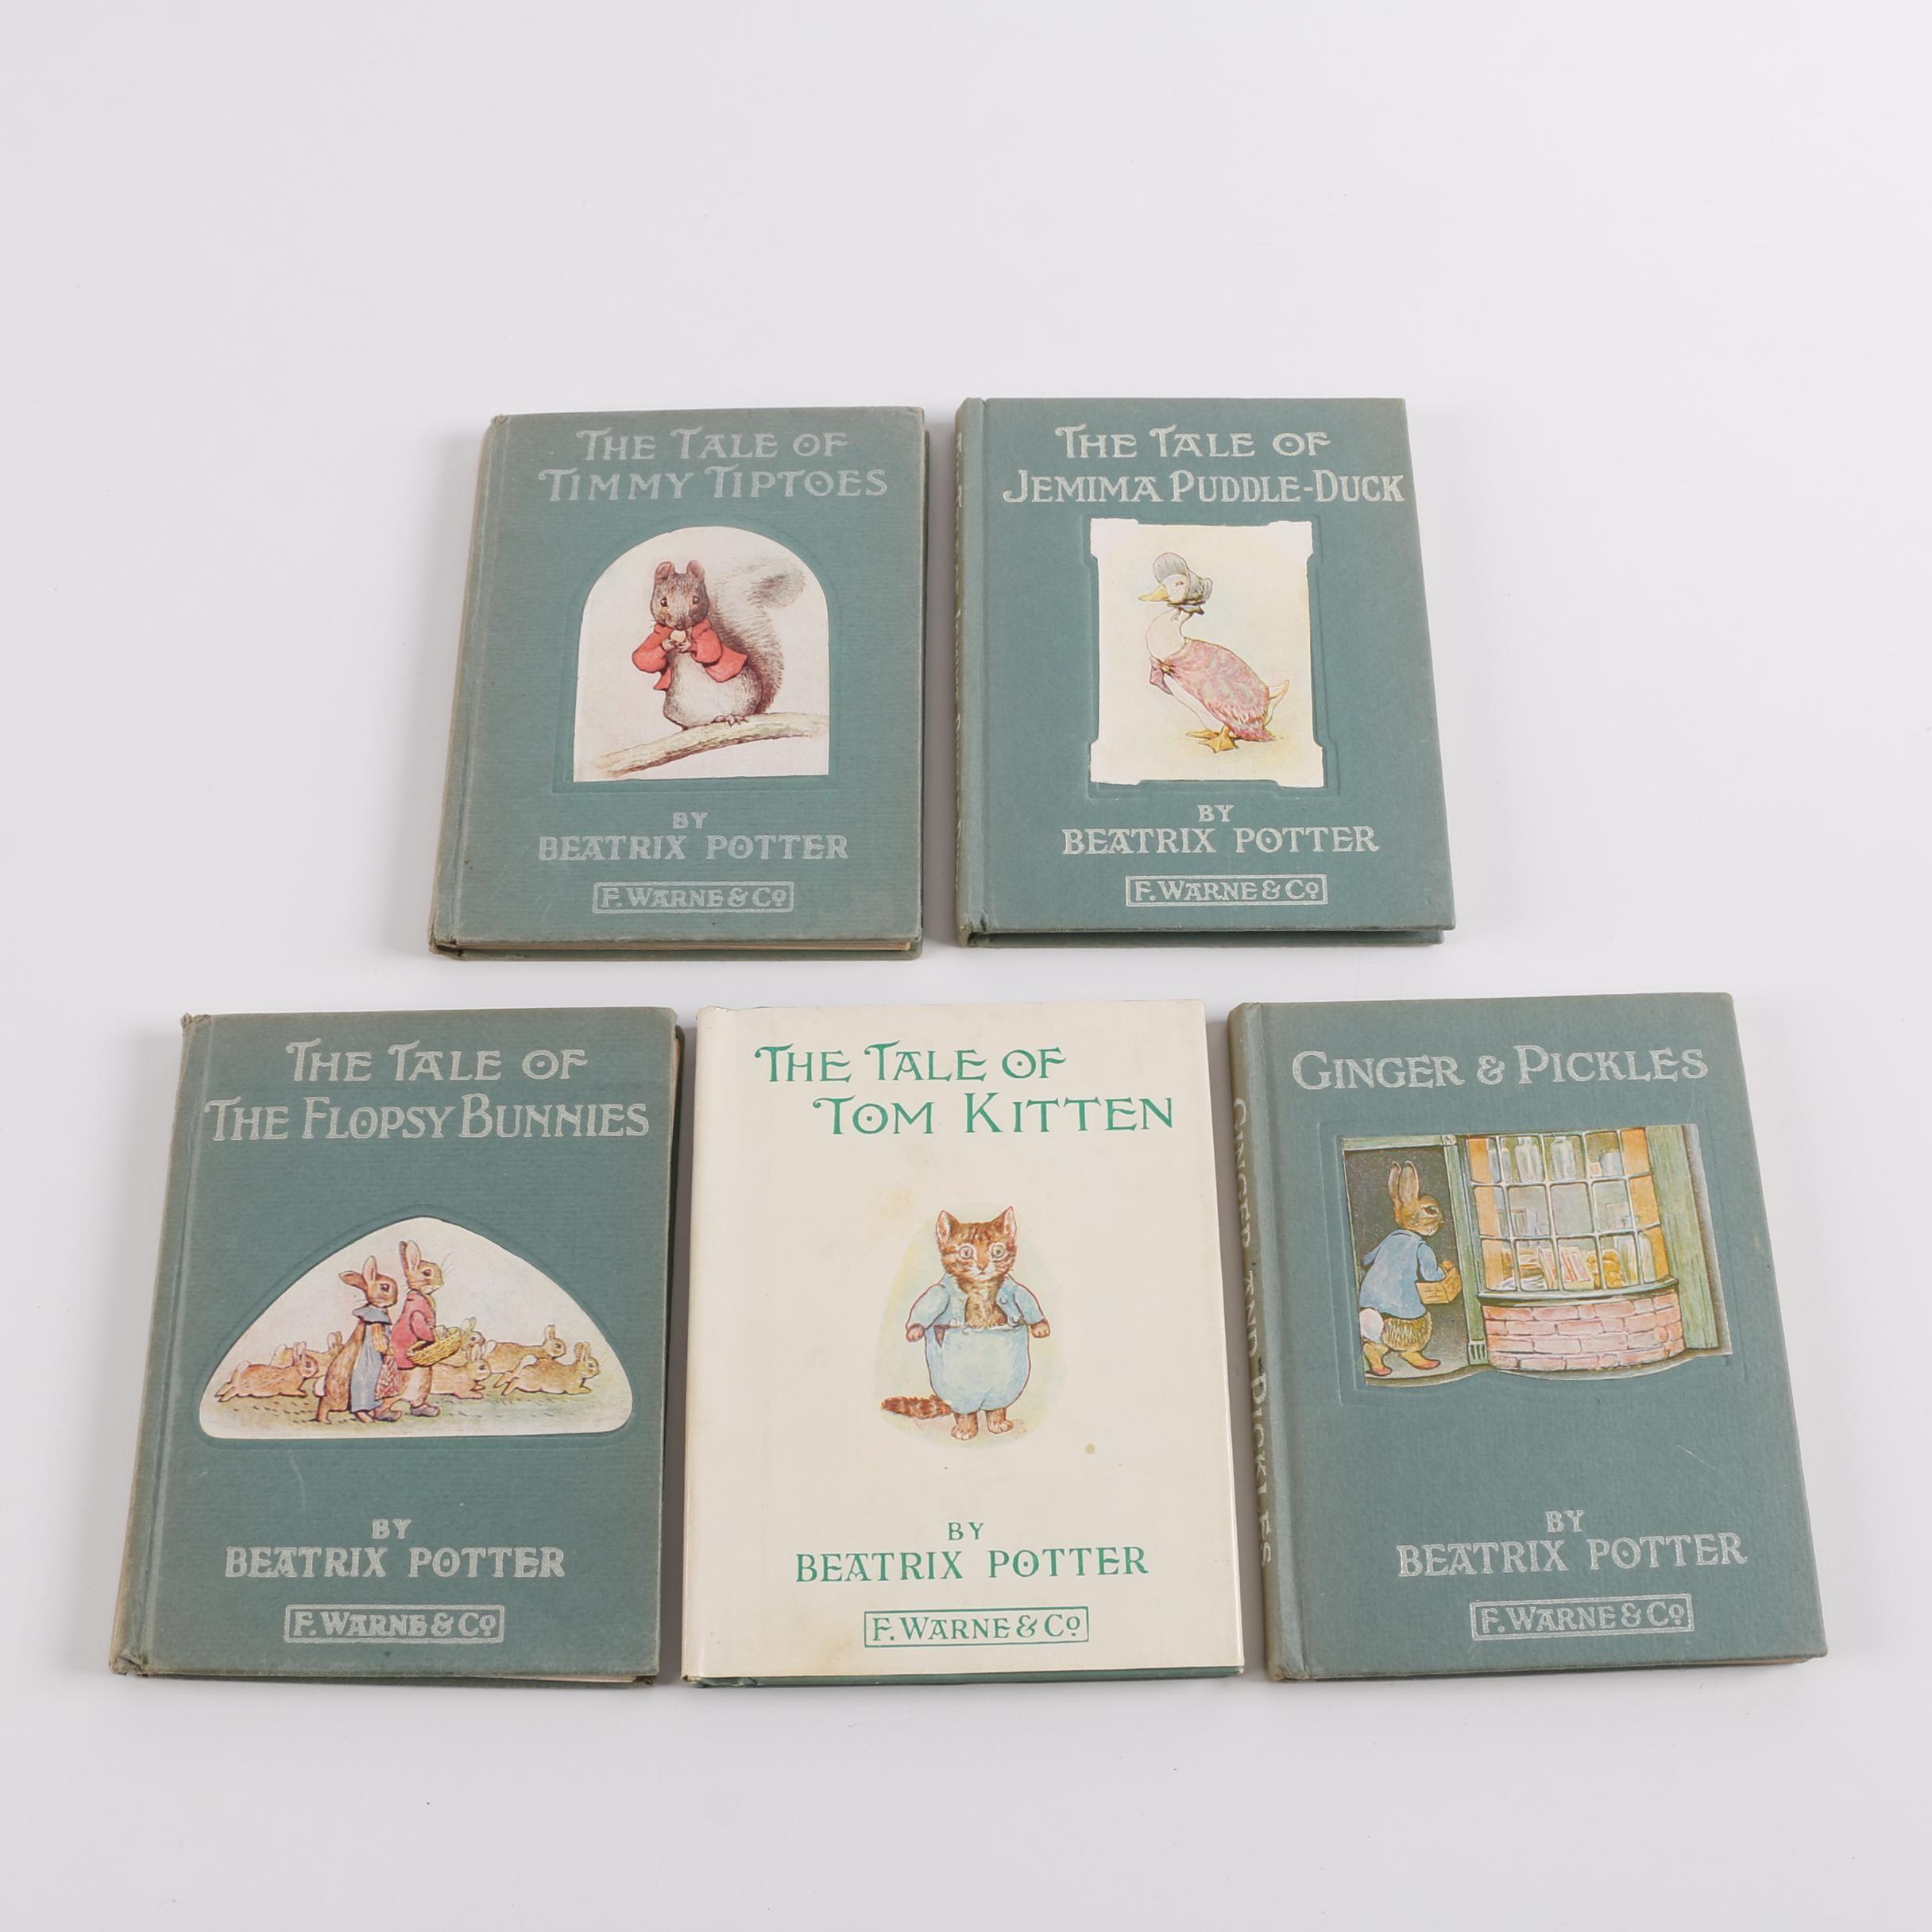 1930s Beatrix Potter Children's Literature